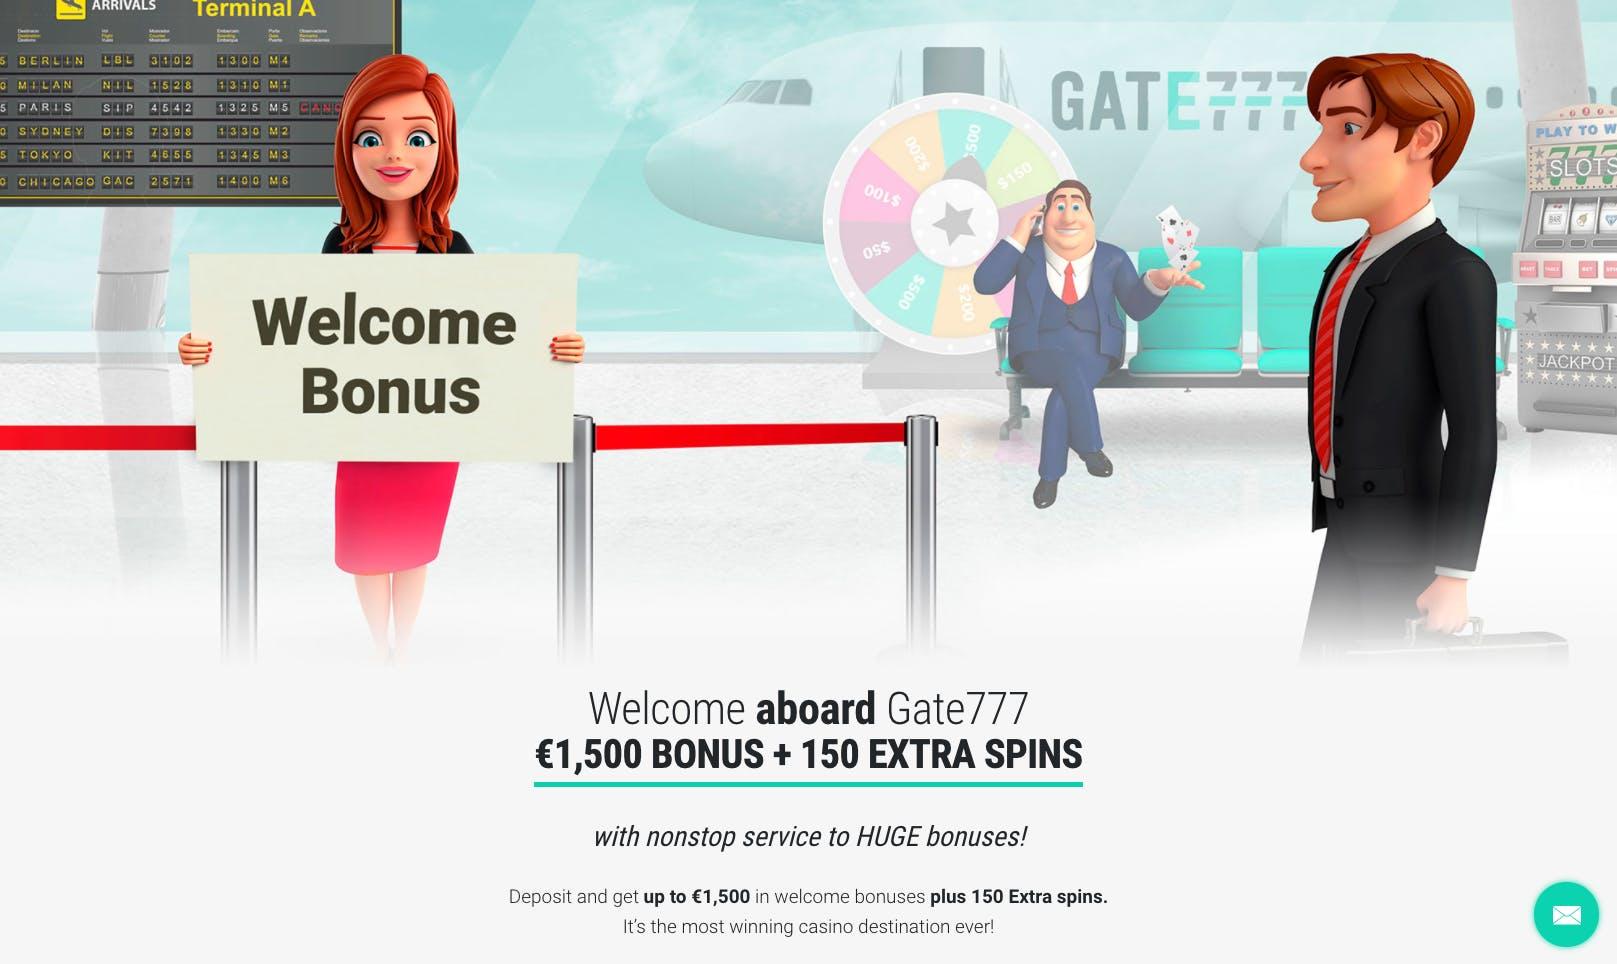 welcome bonus gate777